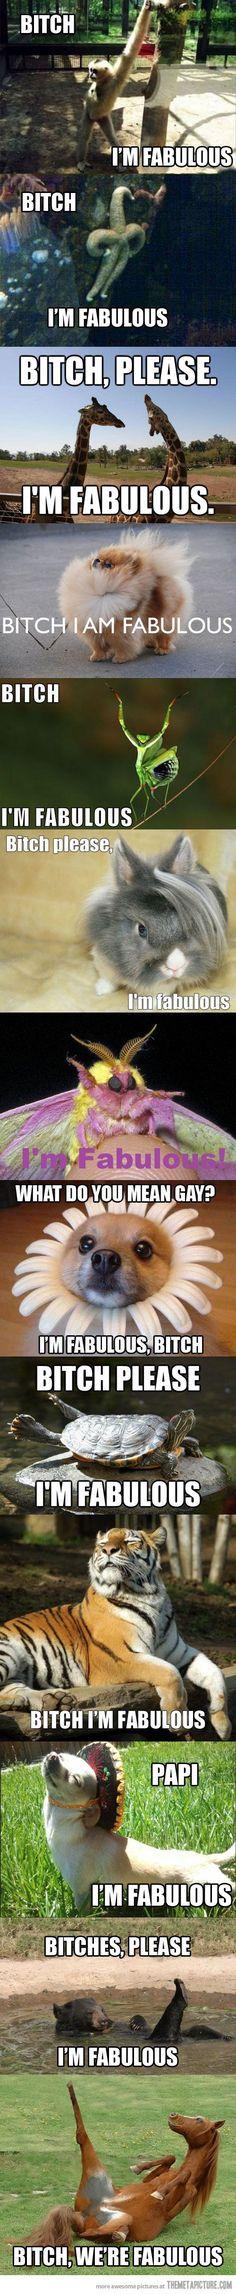 Beesh, I'm fabulous